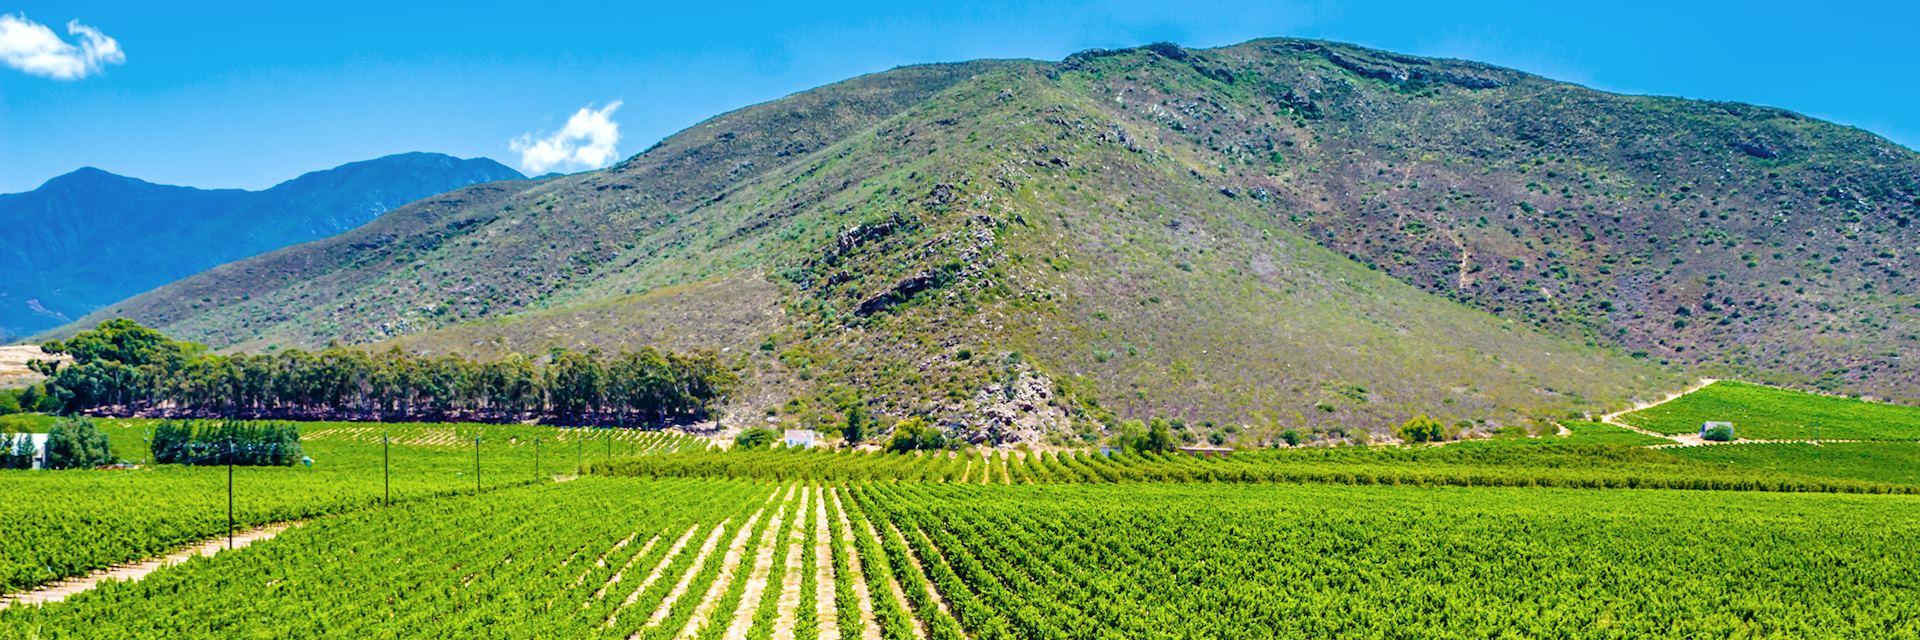 Vineyard in Montagu